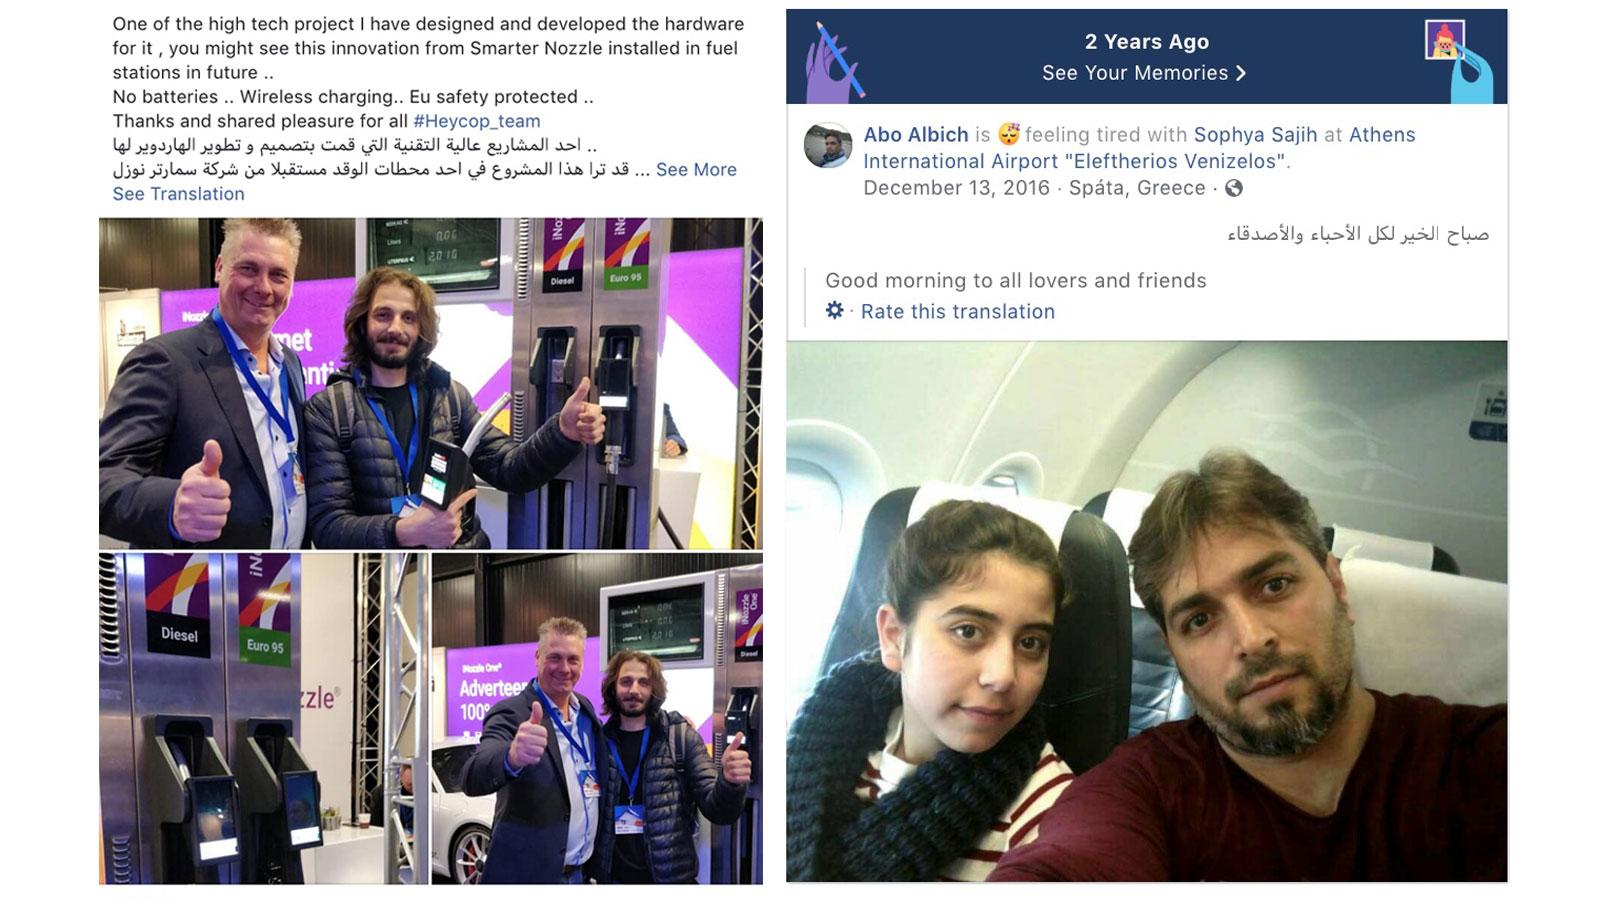 Screenshots of Facebook posts